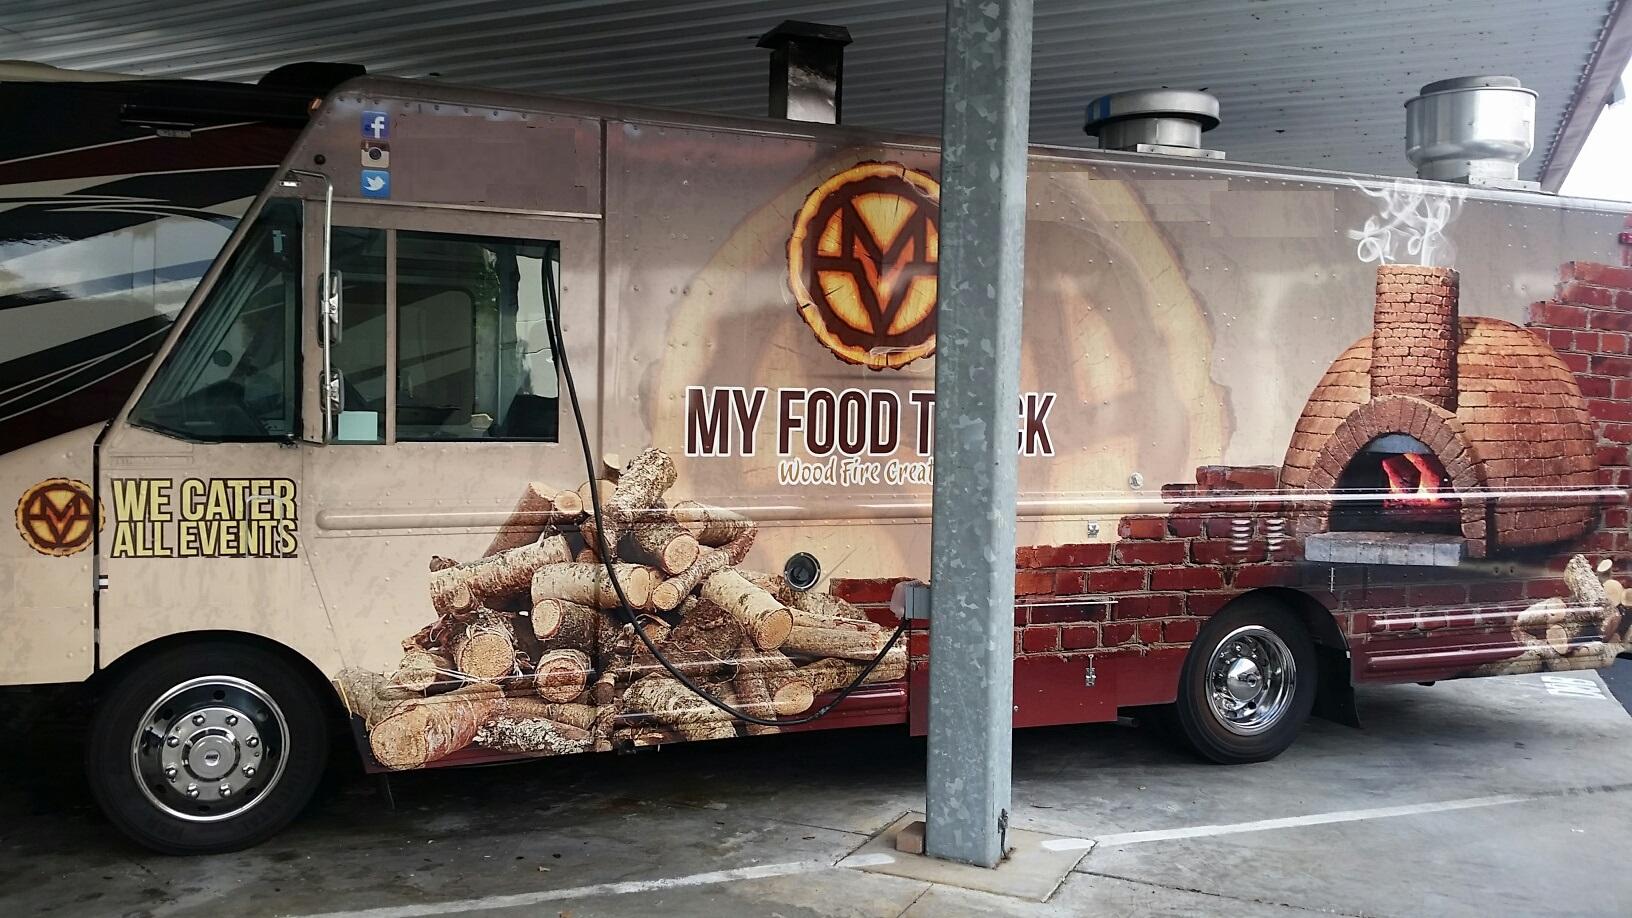 Brick Oven Food Trucks For Sale